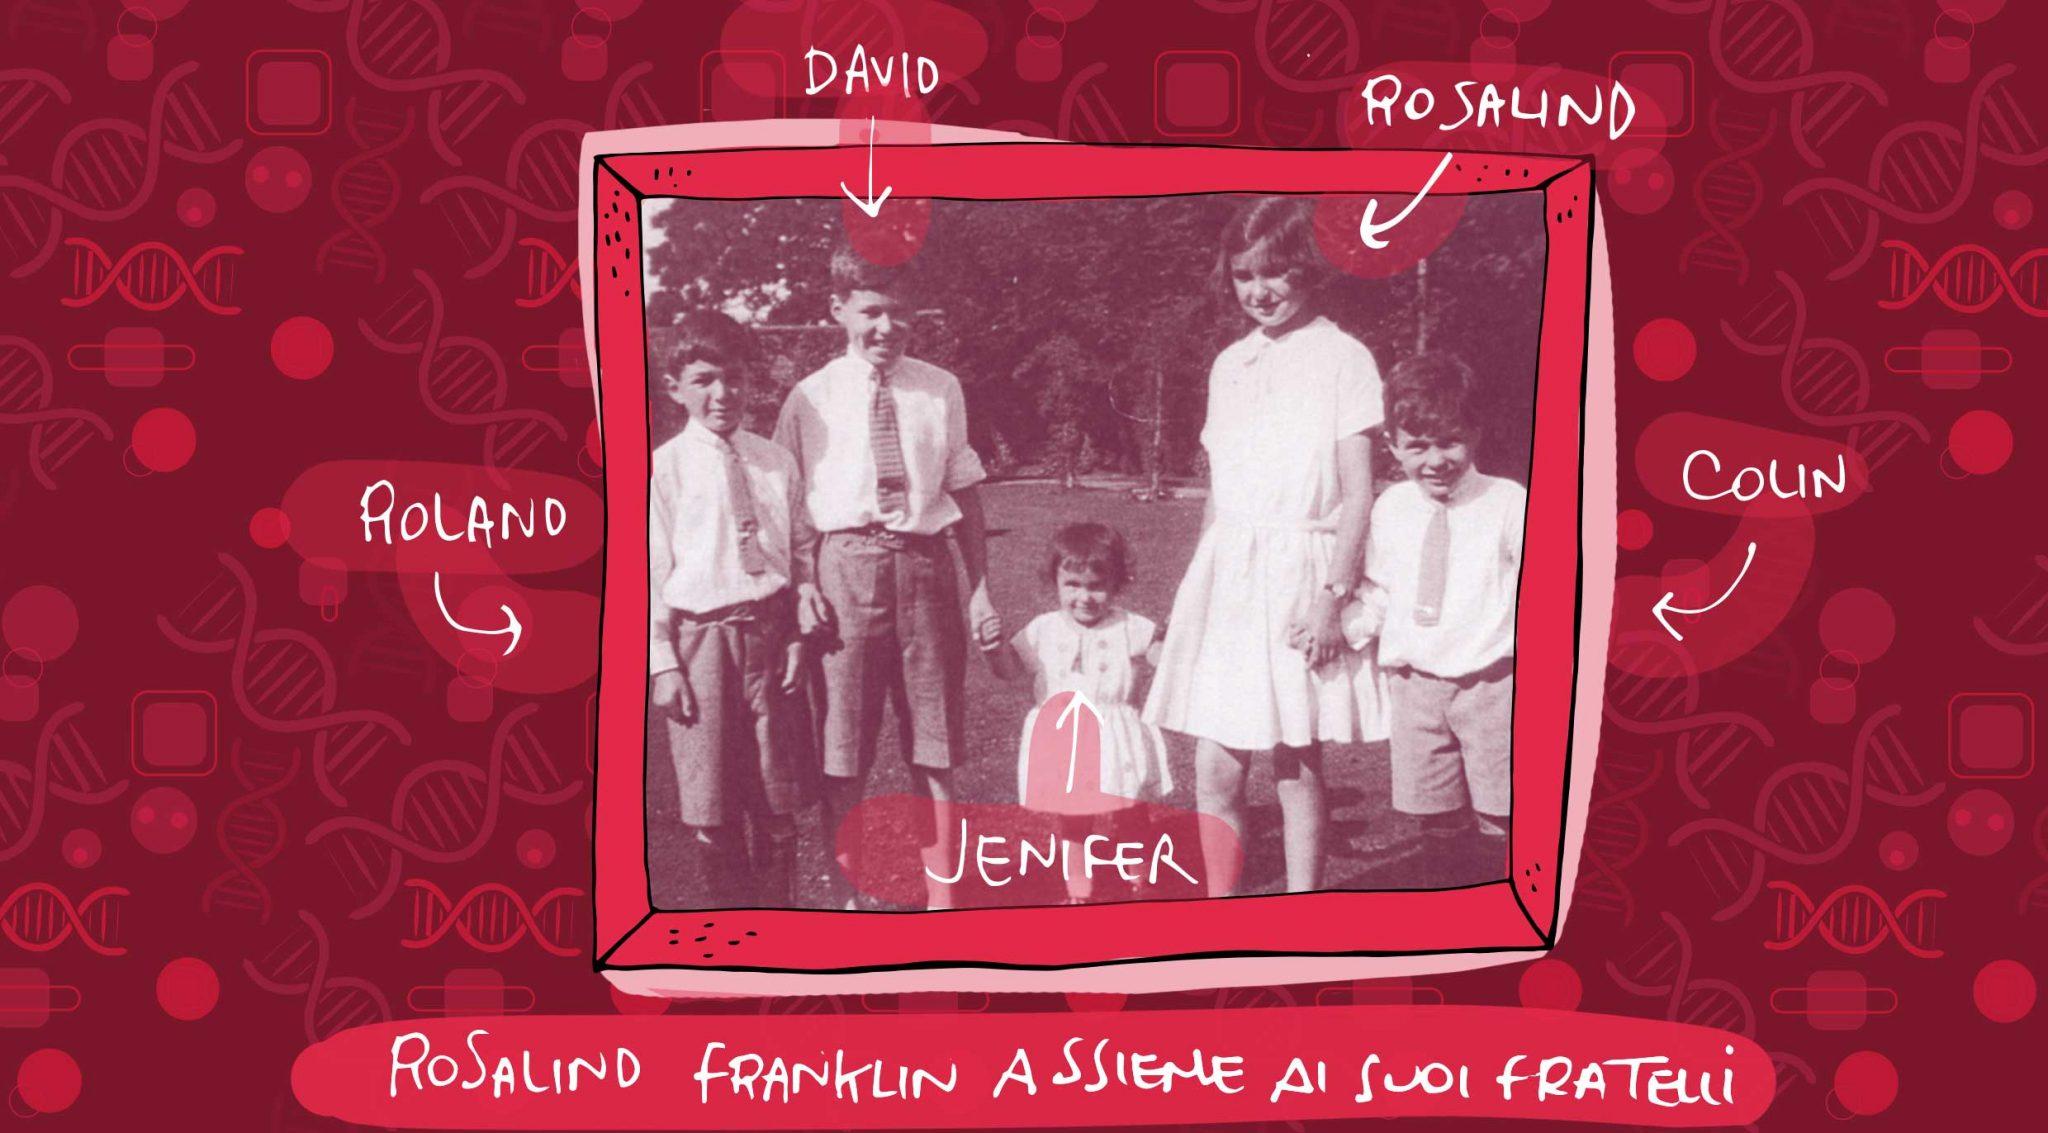 Rosalind-Franklin-famiglia